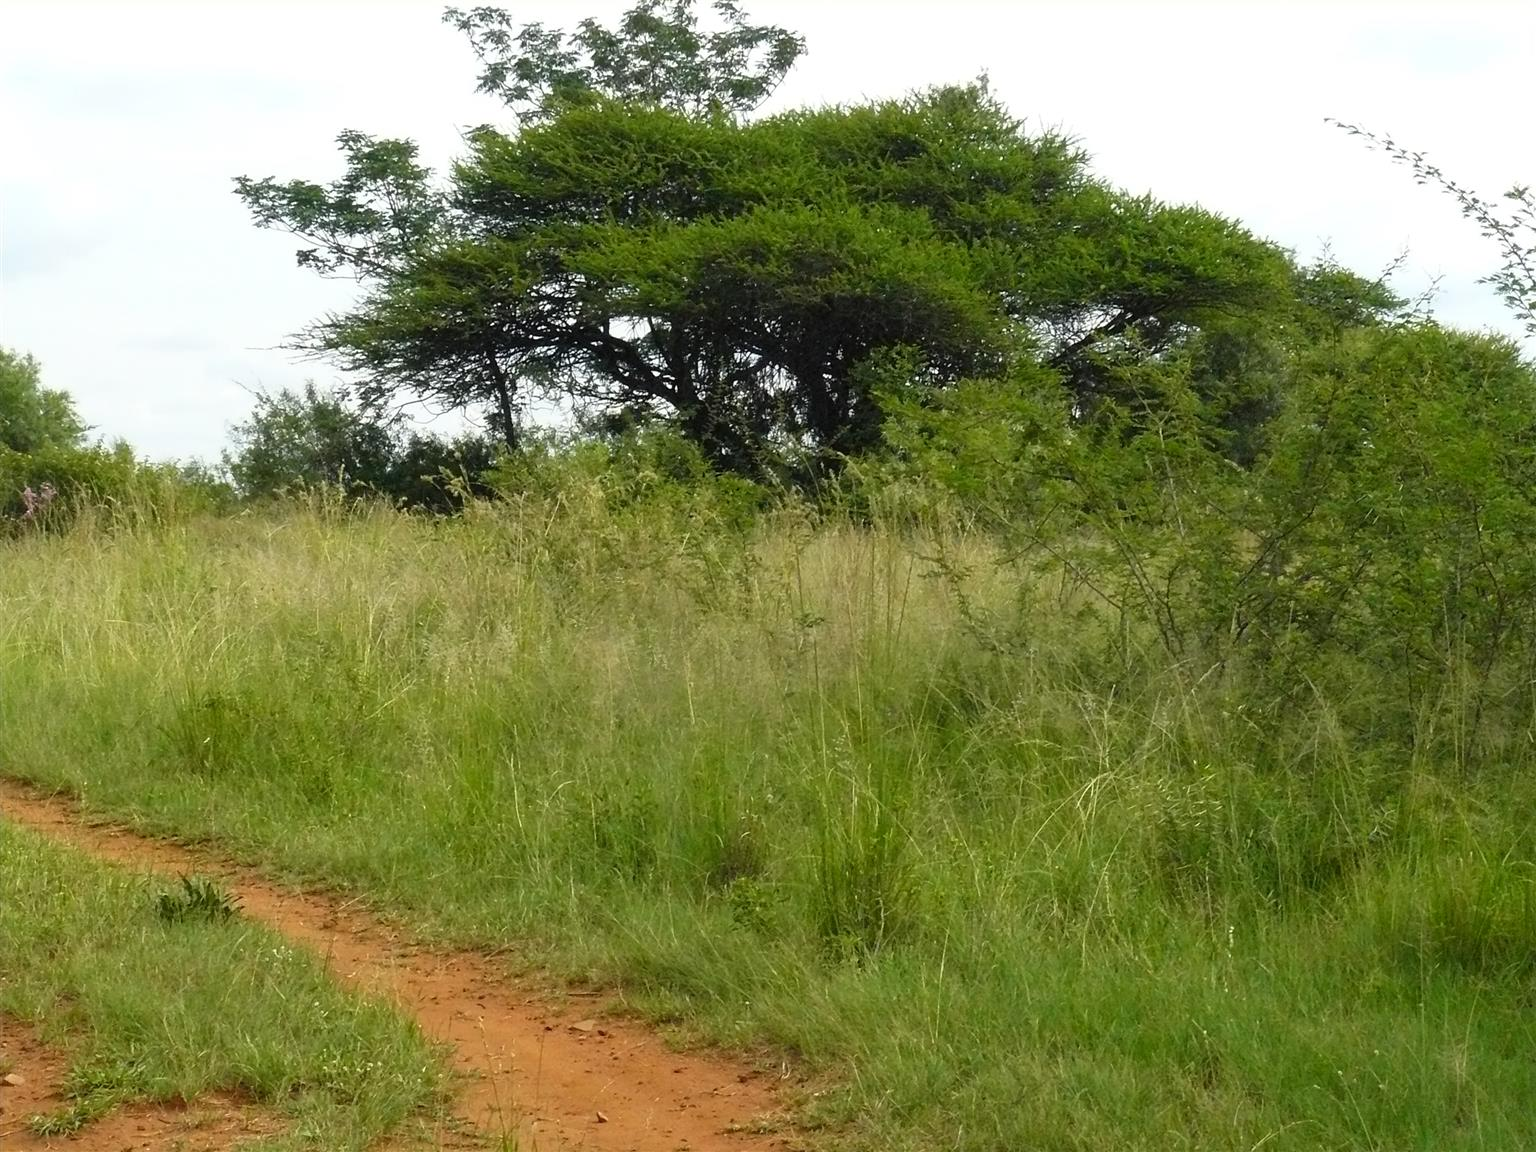 Available 8.5 ha vacant land in Leeuwfontein, Pretoria